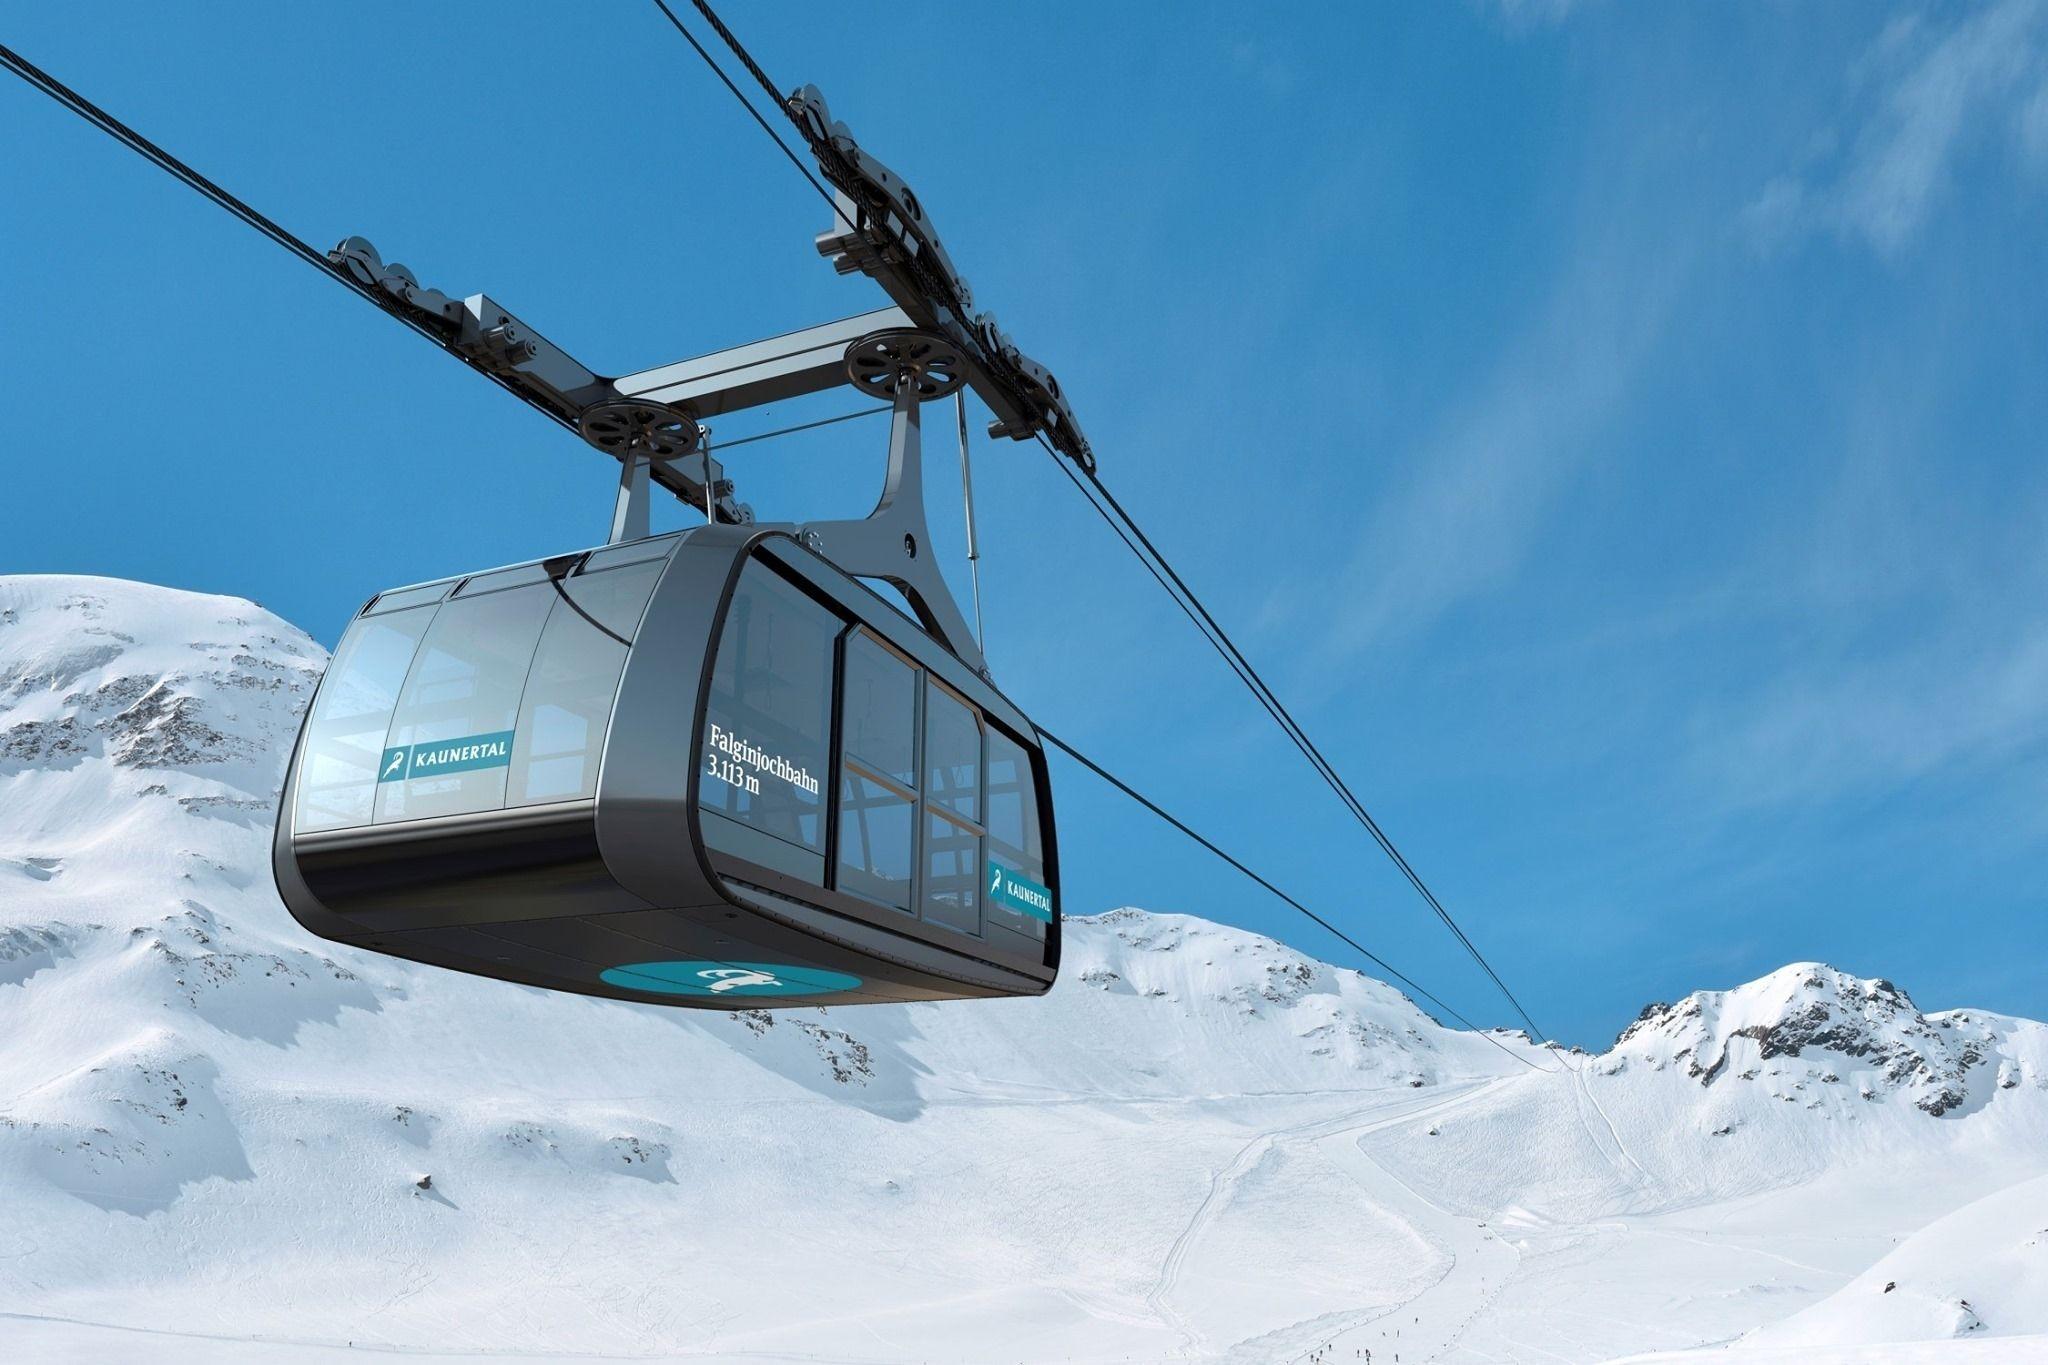 Nieuwe 100-persoons skilift op de Kaunertaler Gletscher: de Falginjochbahn (deel 3)